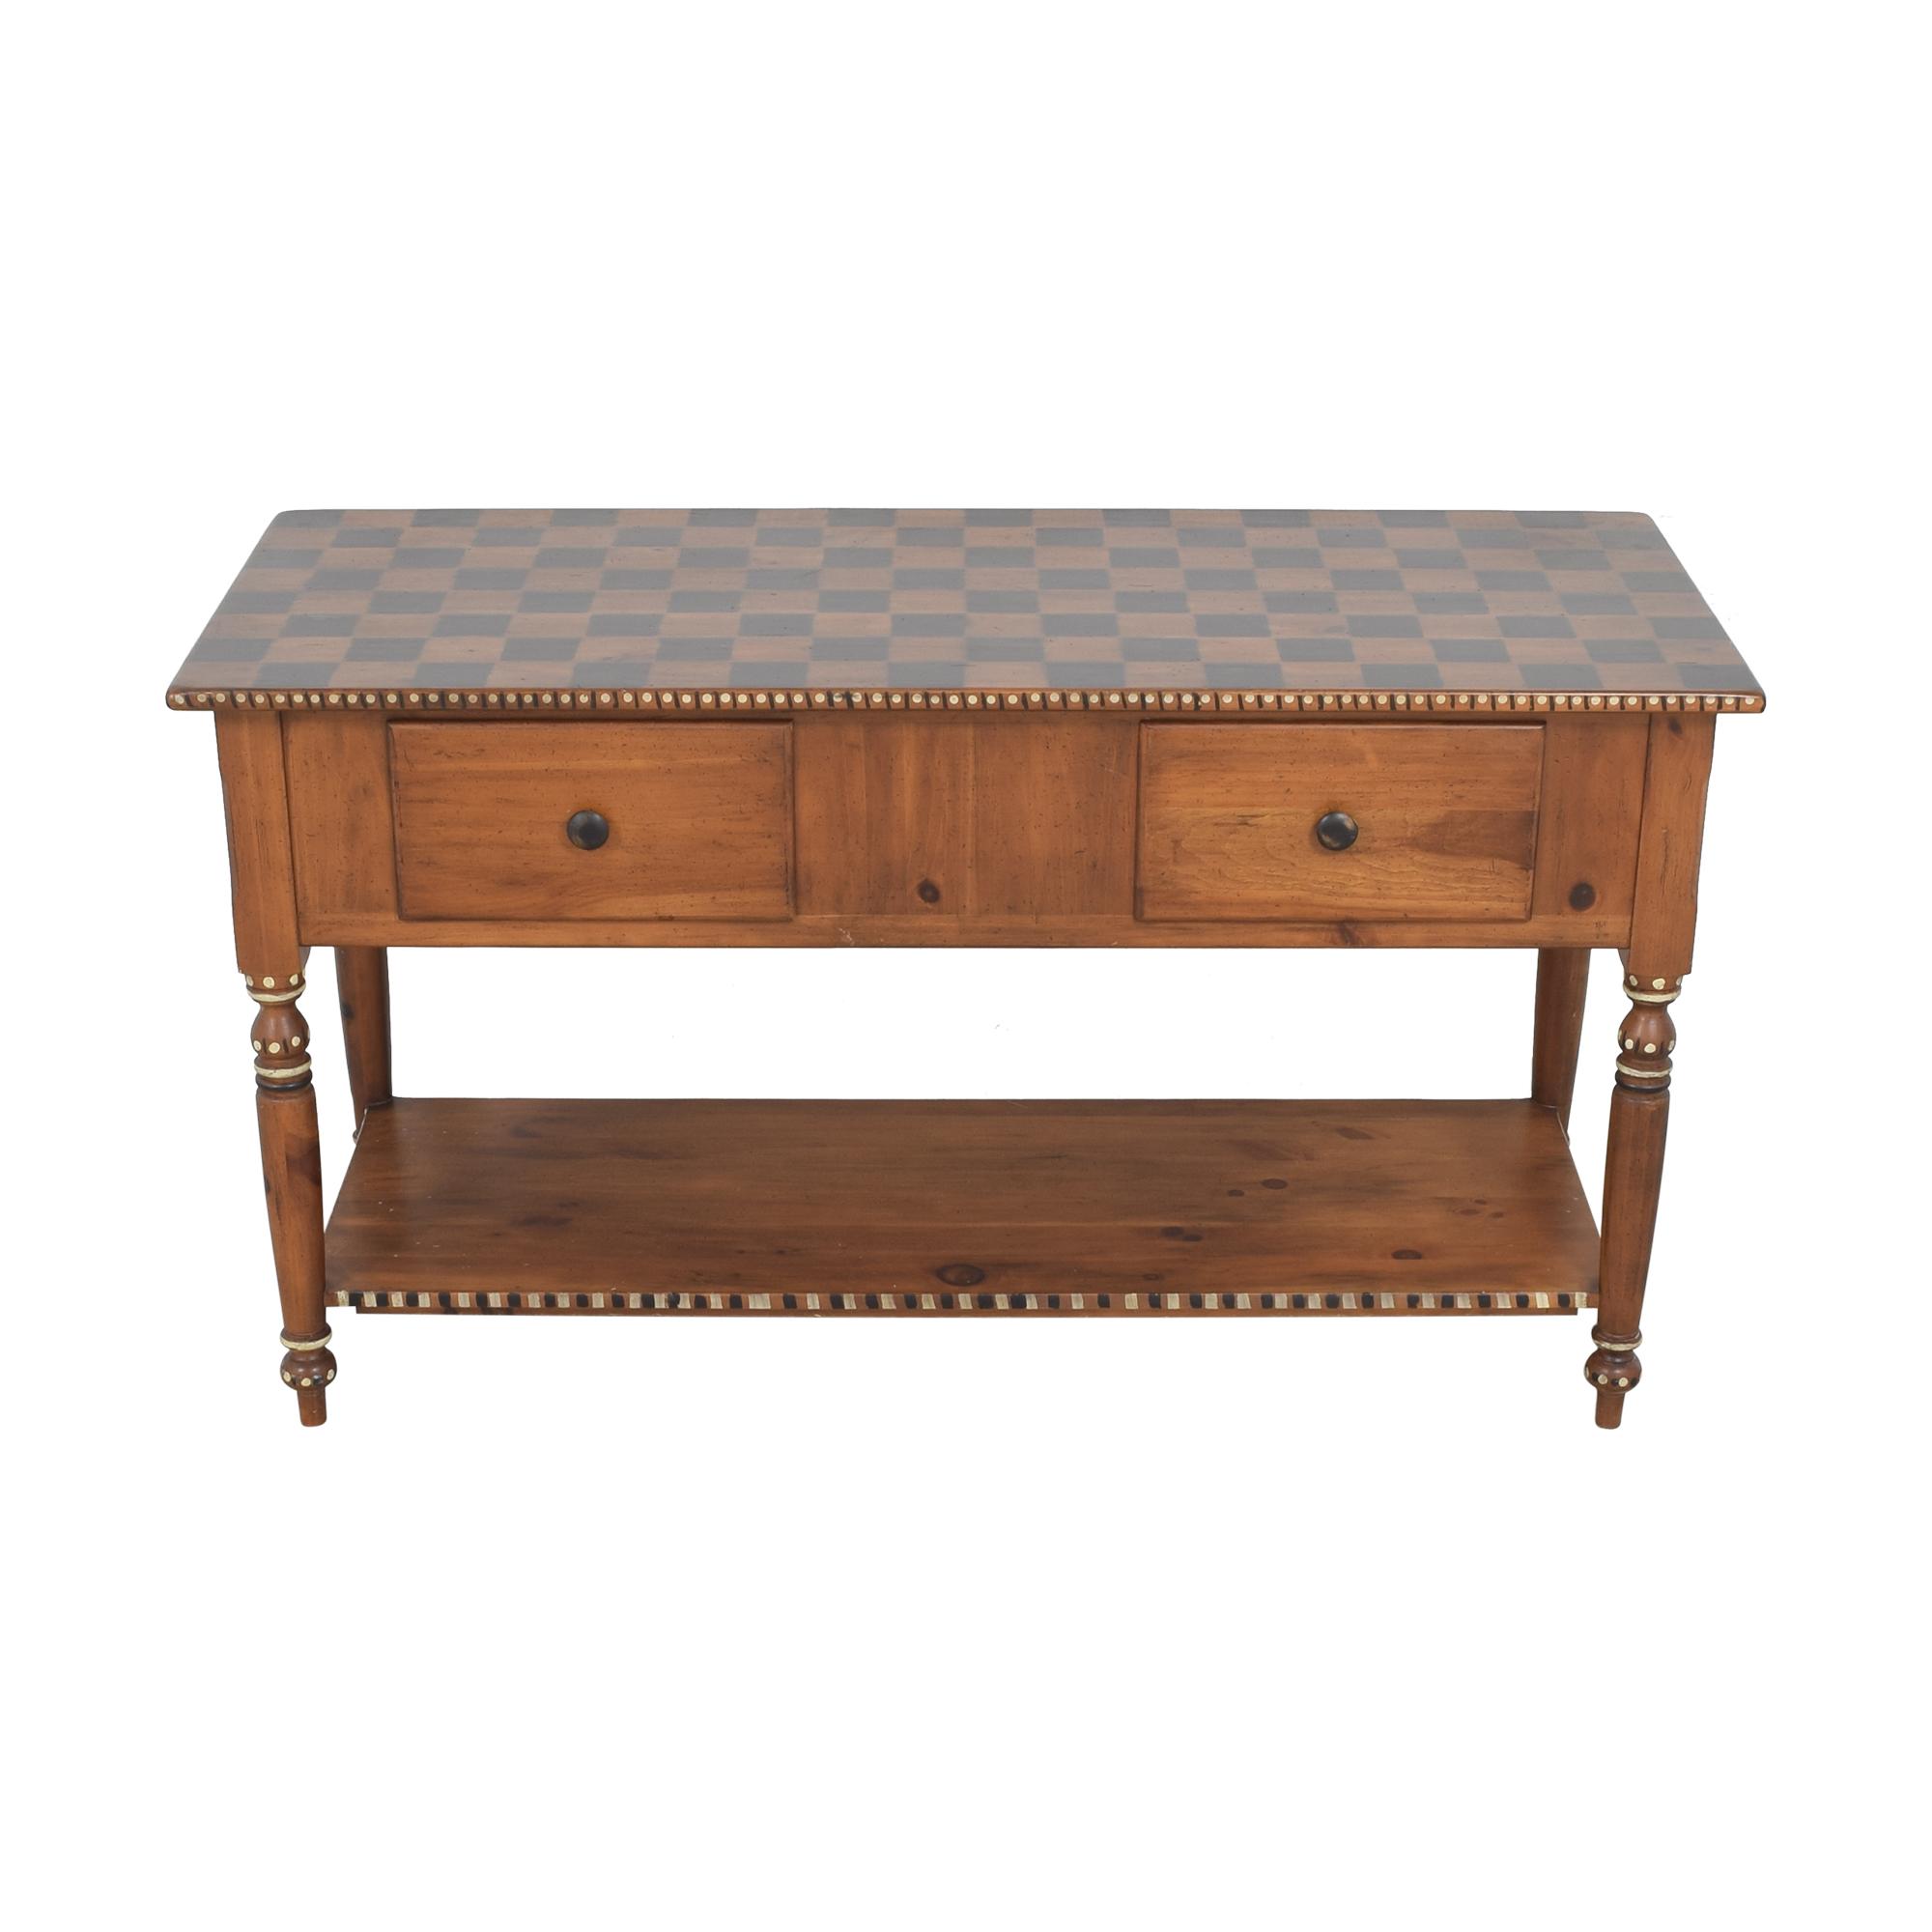 Habersham Habersham Console Table with Two Drawers nj